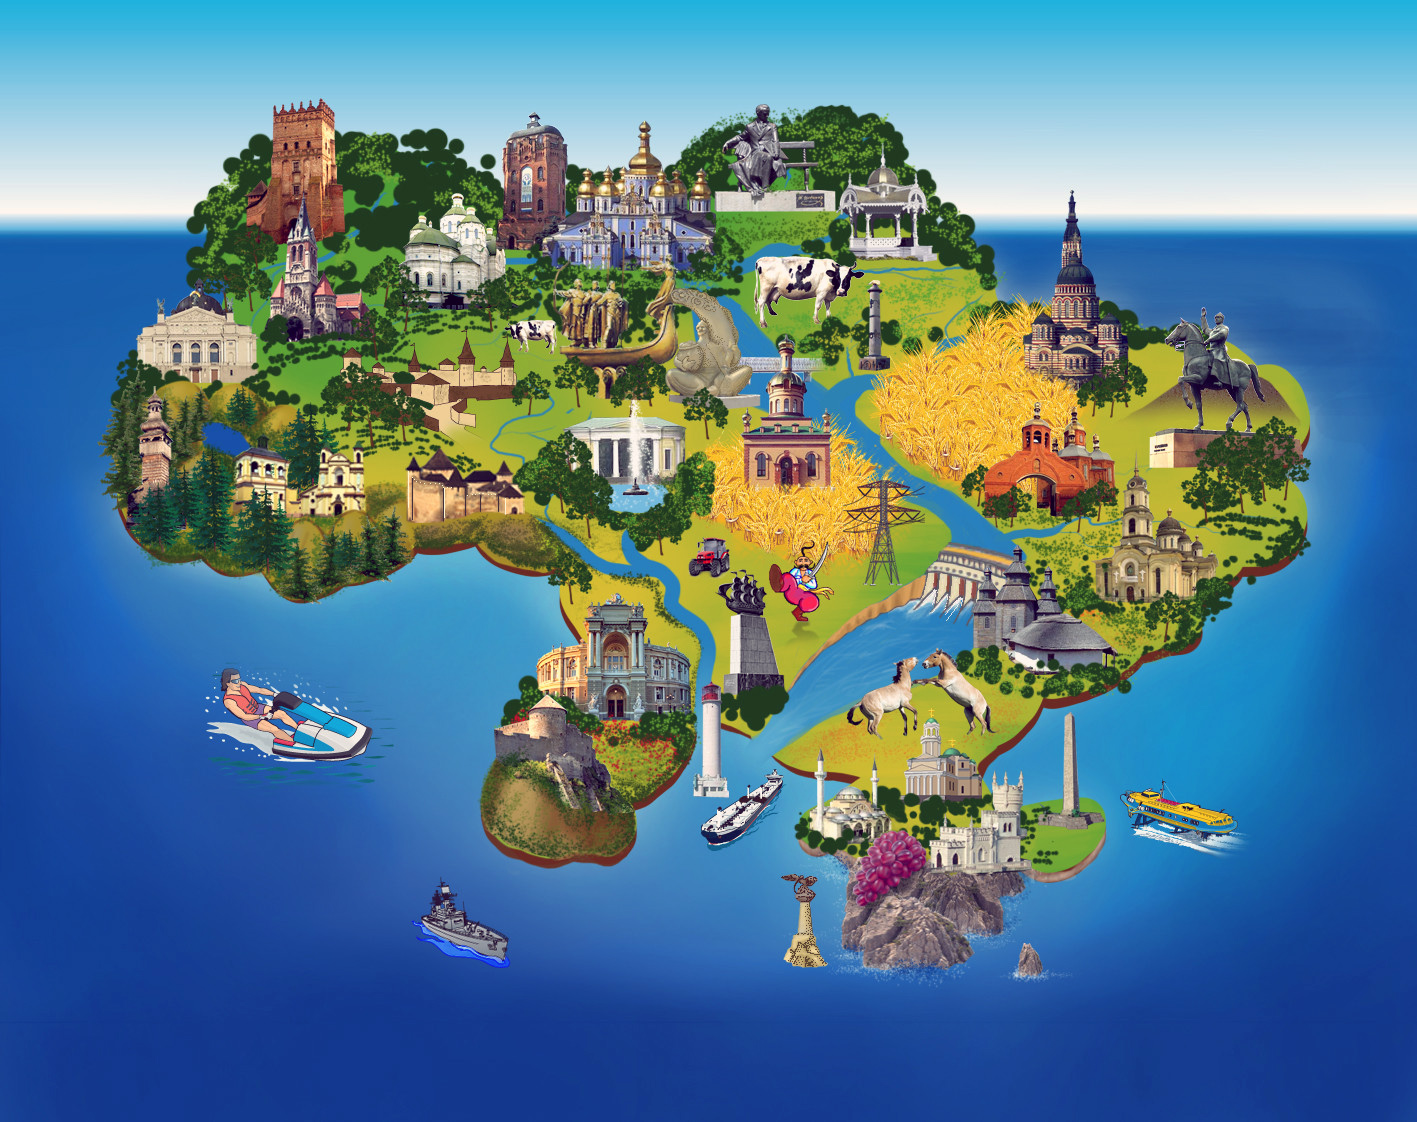 detailed-tourist-map-image-of-ukraine